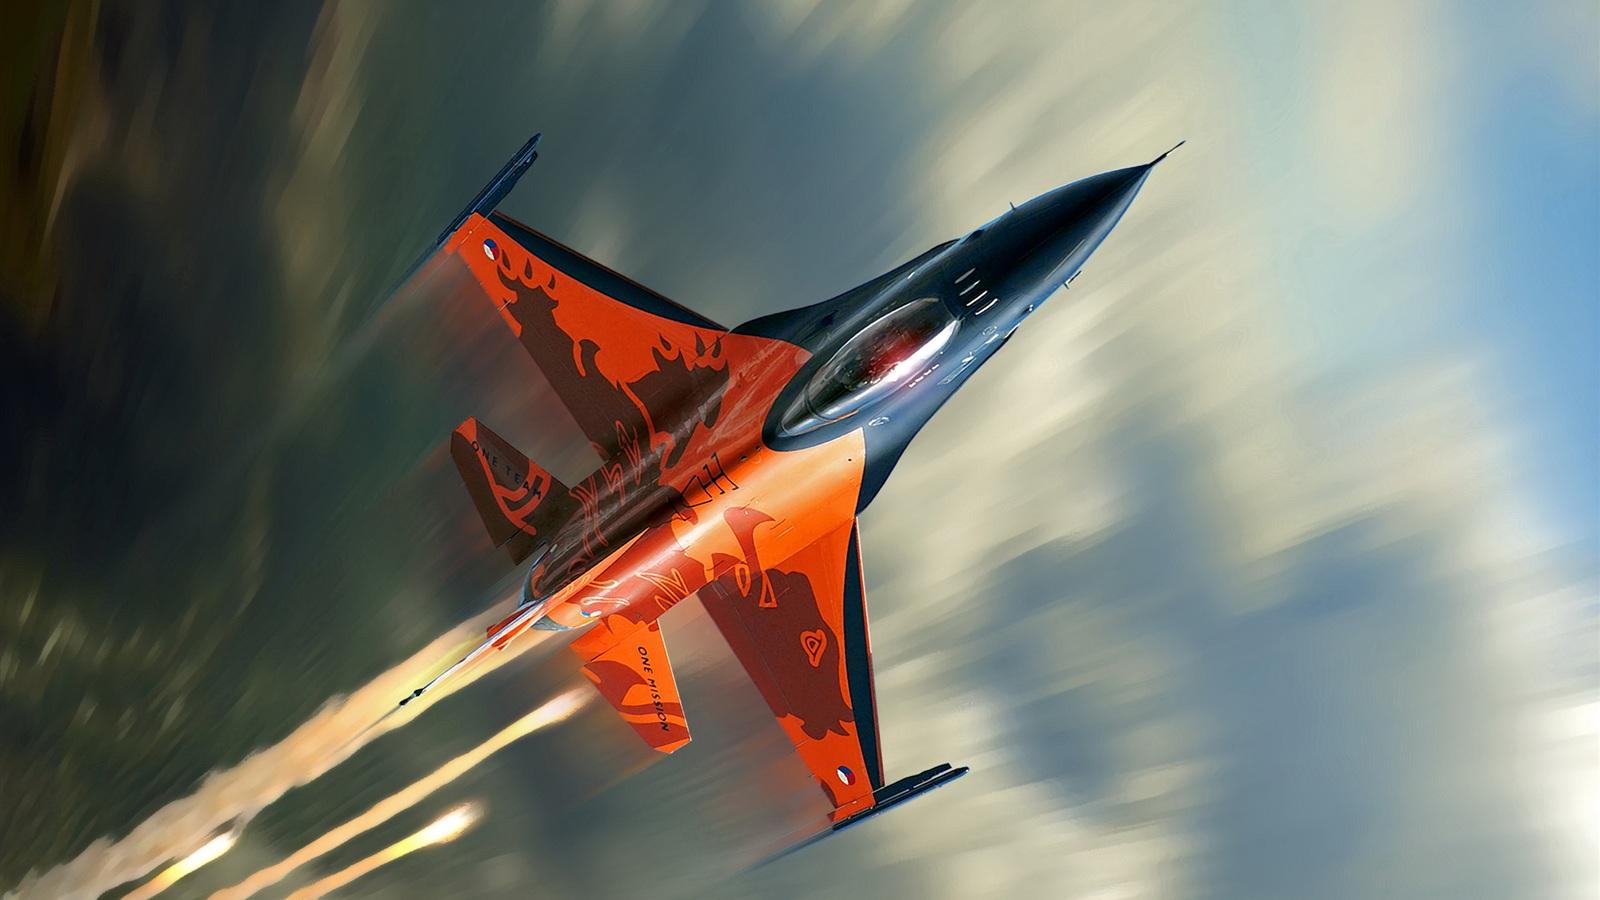 F 16 (戦闘機)の画像 p1_33